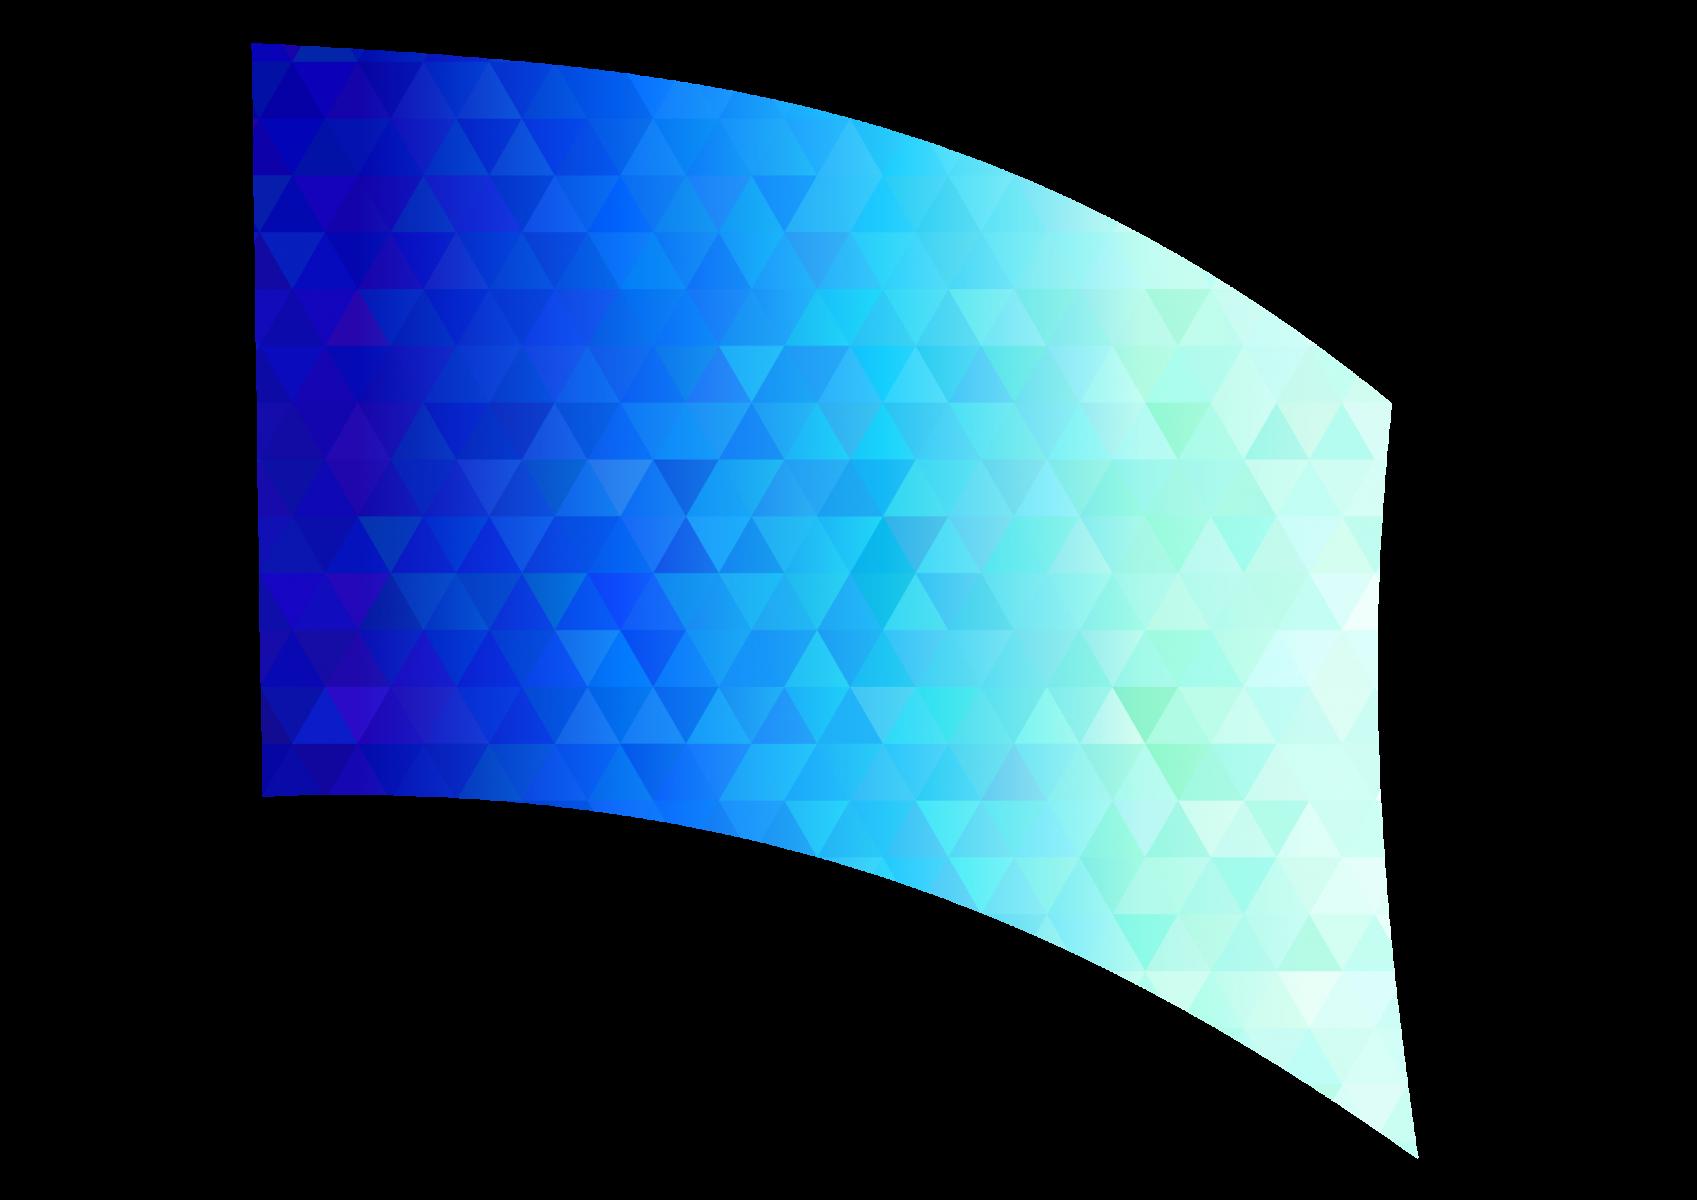 010101s - 36x54 Standard Blue-Green Diamond Ombre